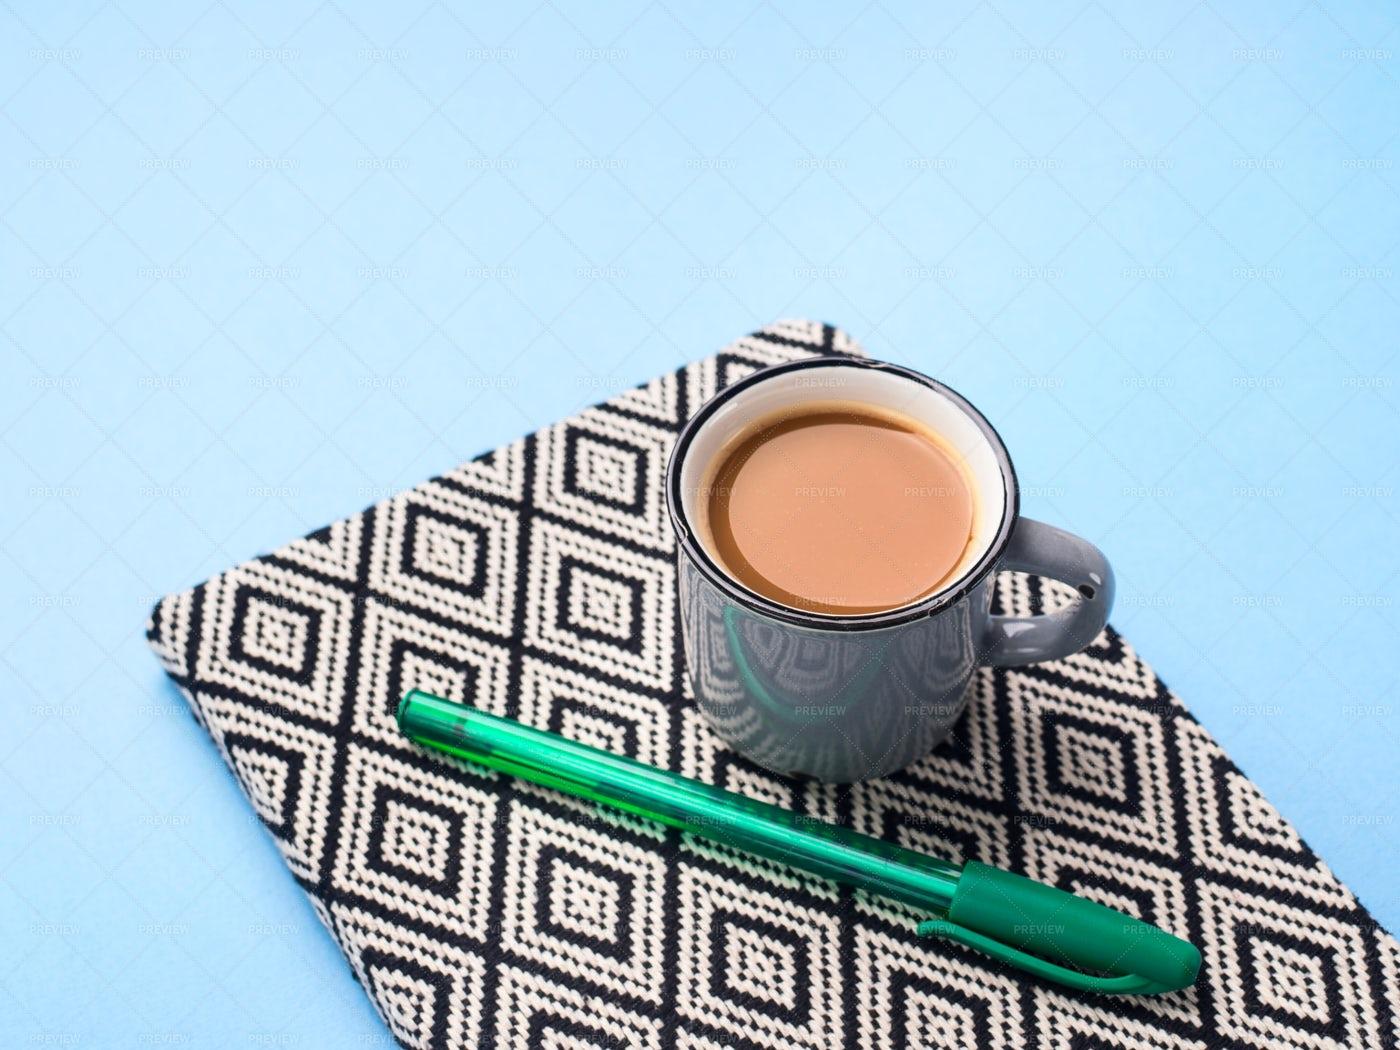 Planning Agenda And Coffee: Stock Photos